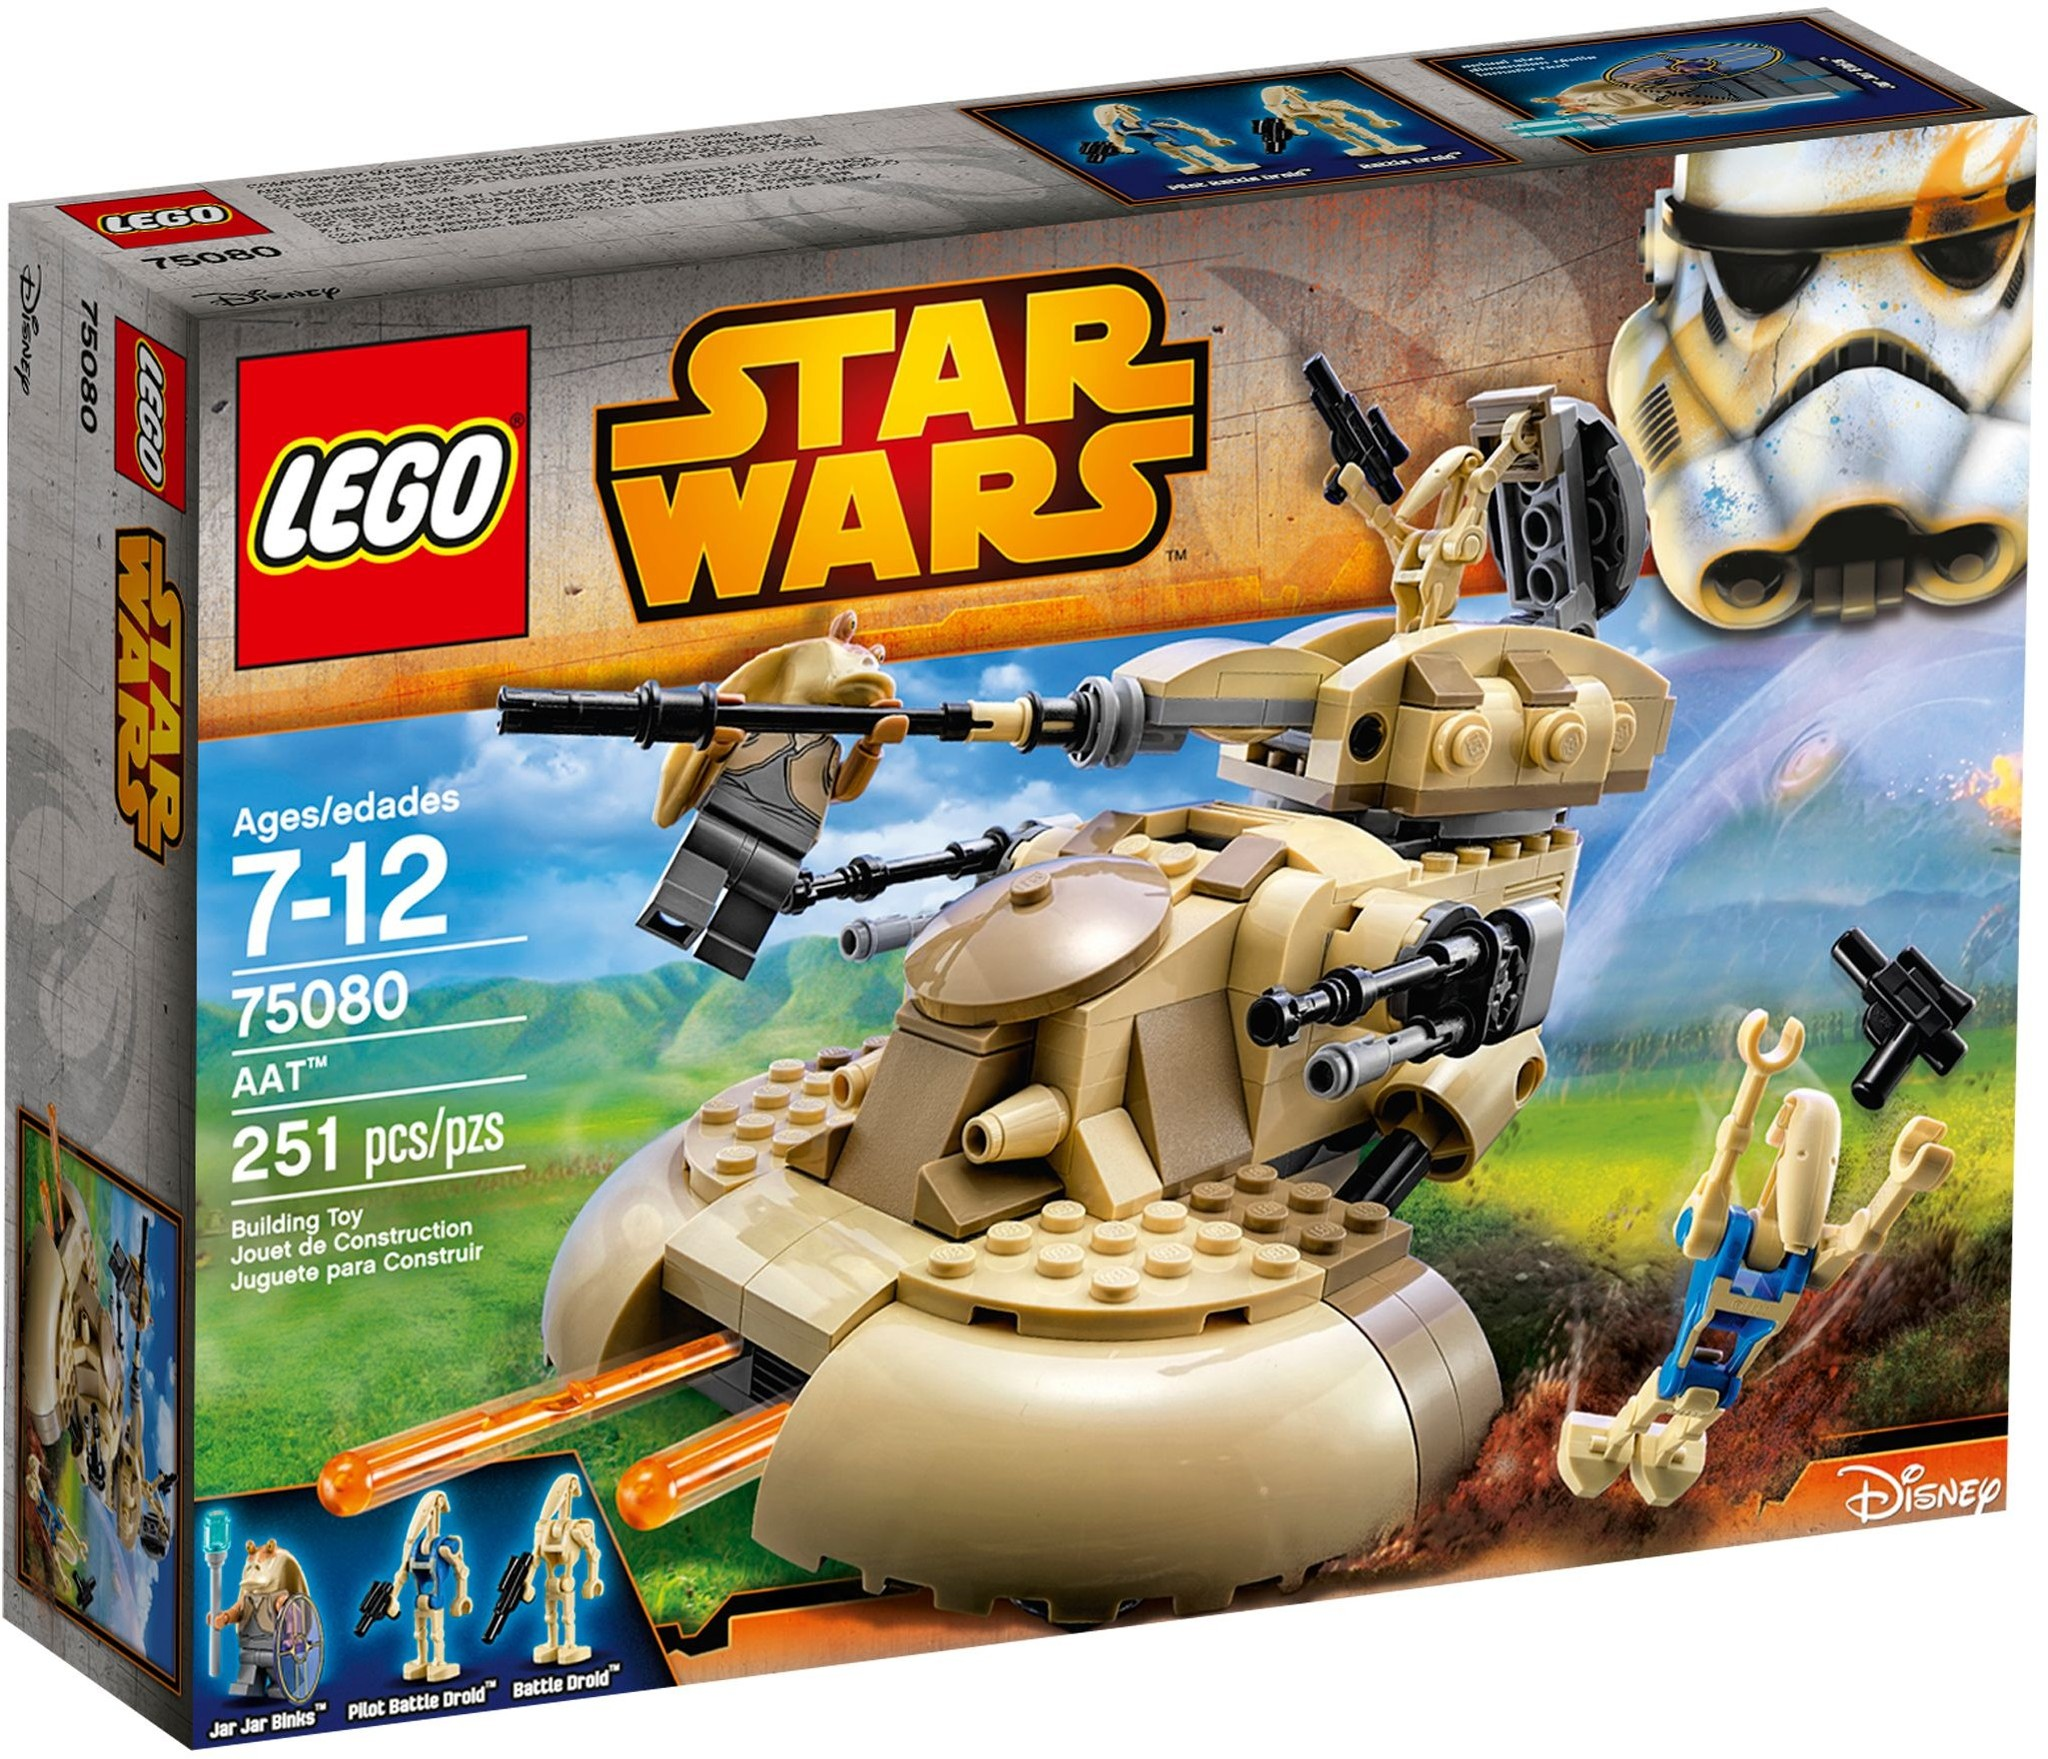 LEGO 75080 - Star Wars - AAT